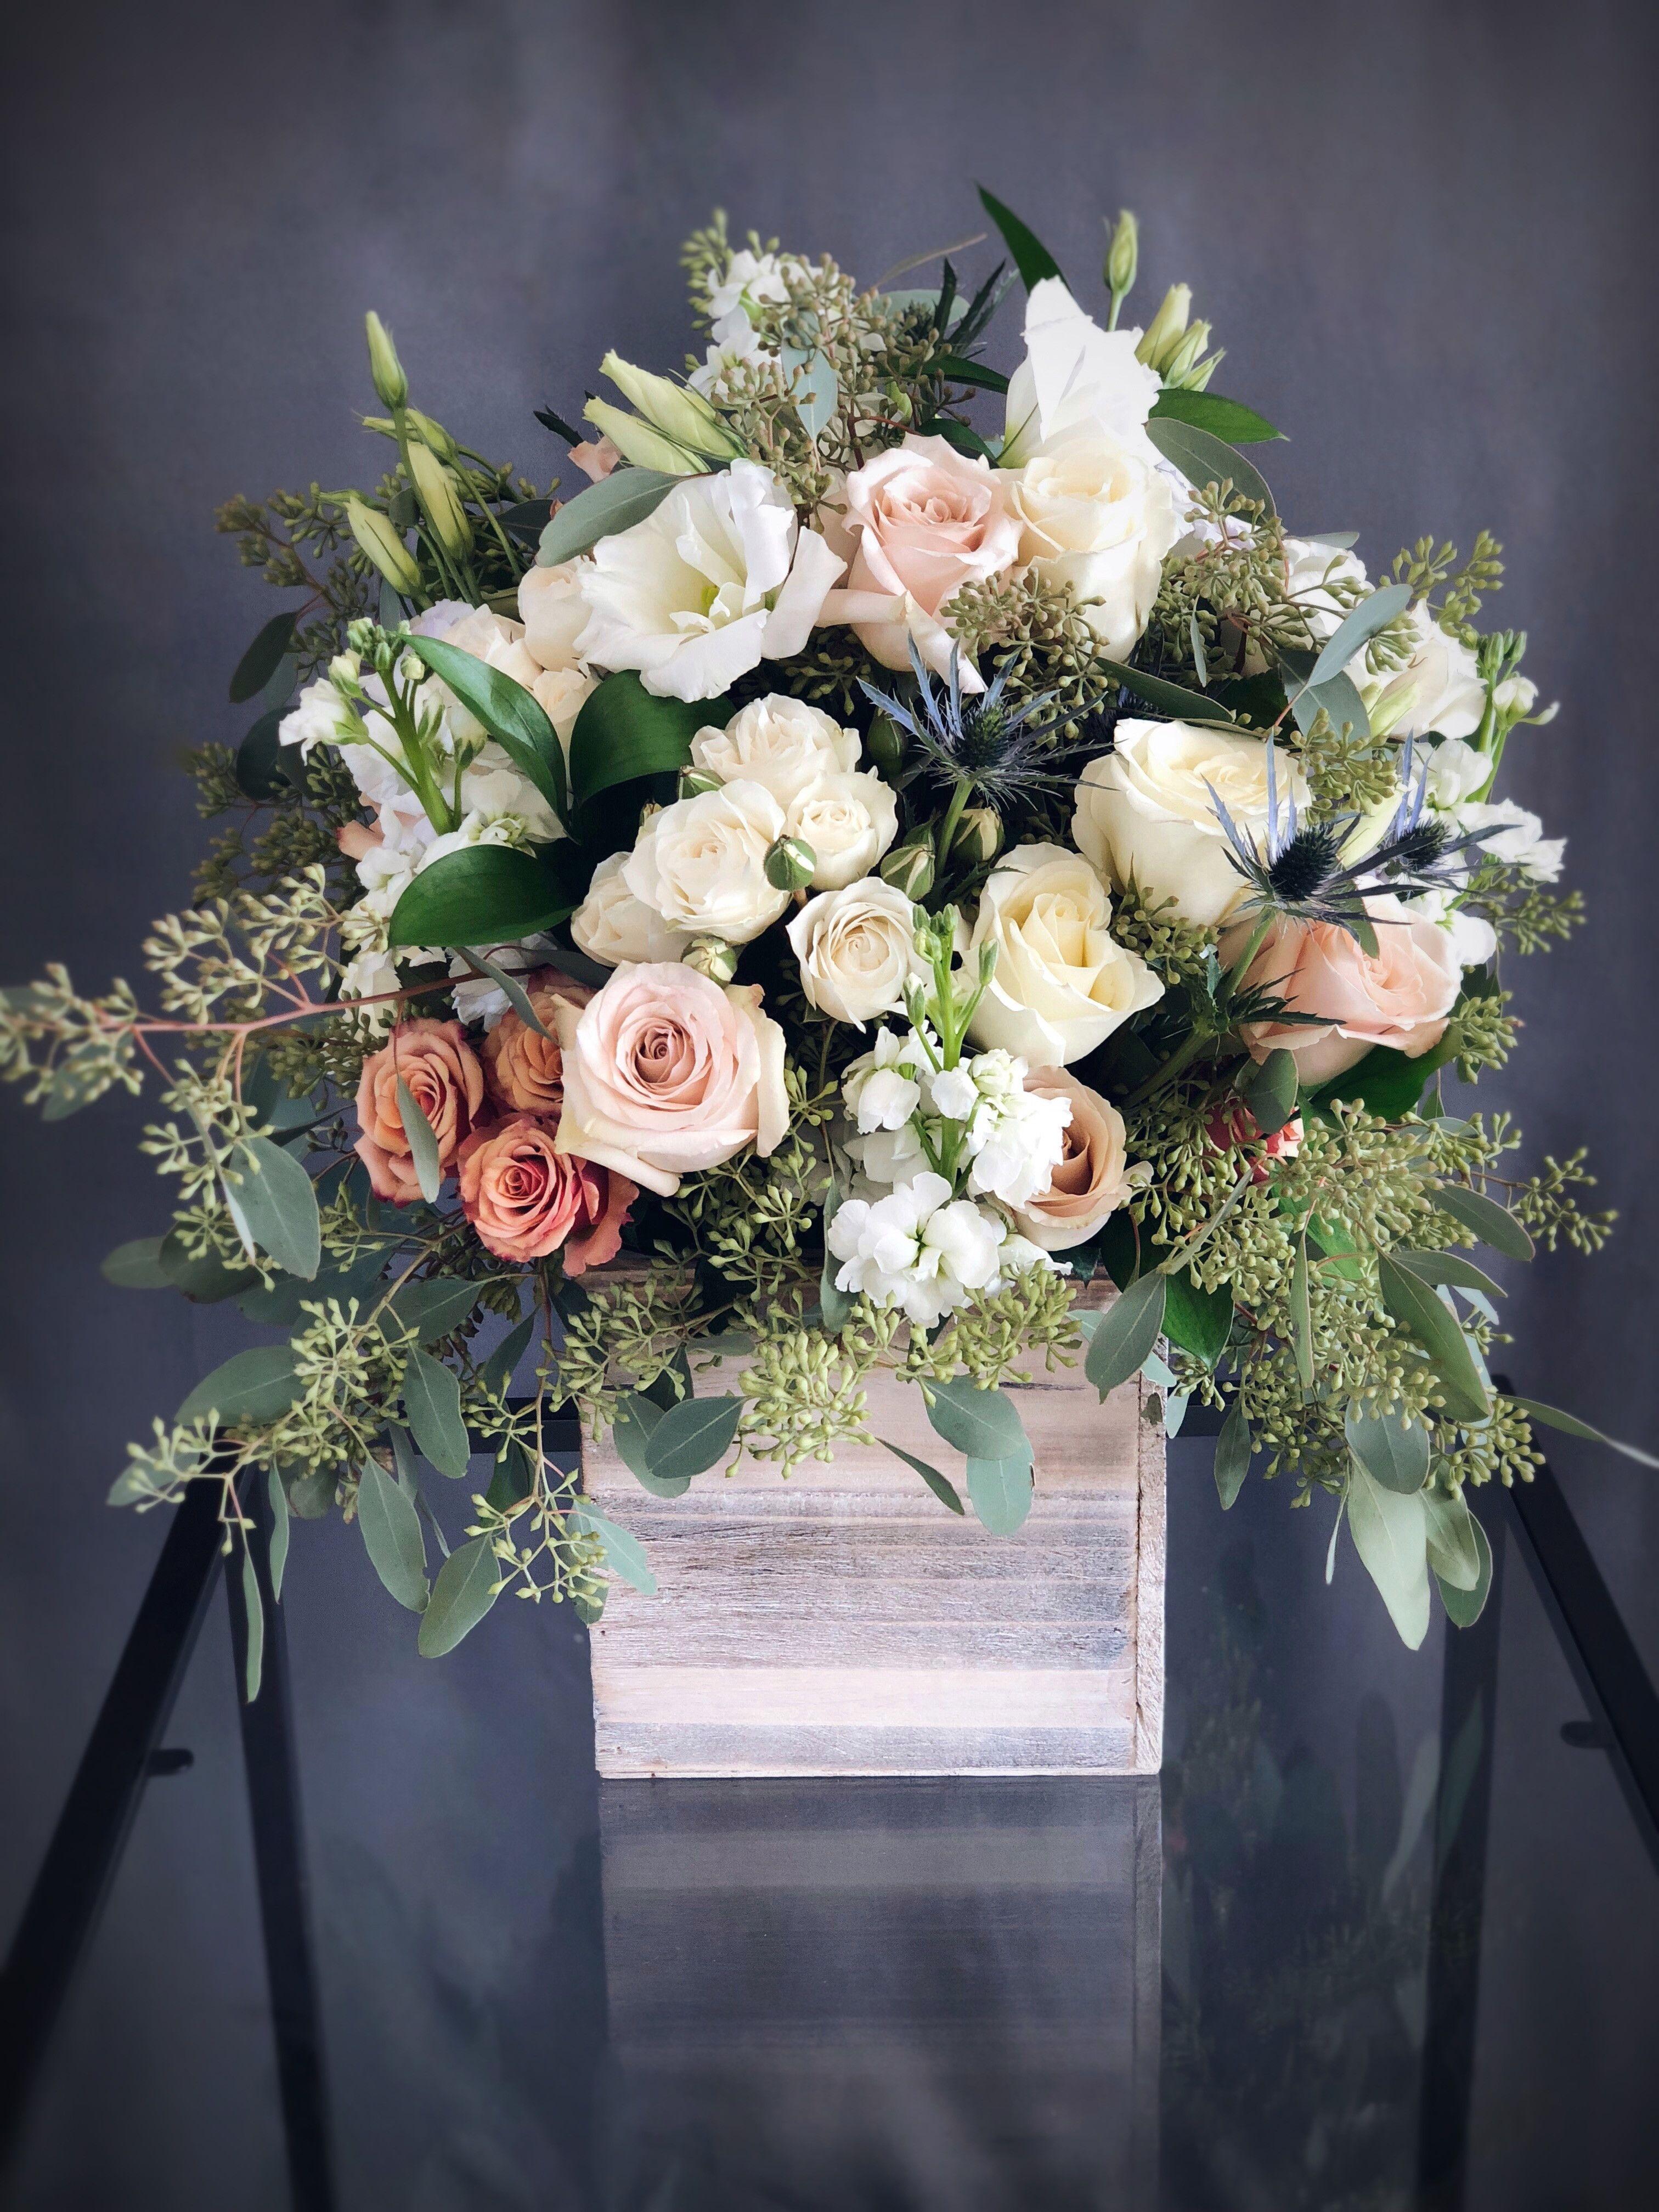 Send 19 Tall White & Pink wood box arrangement in